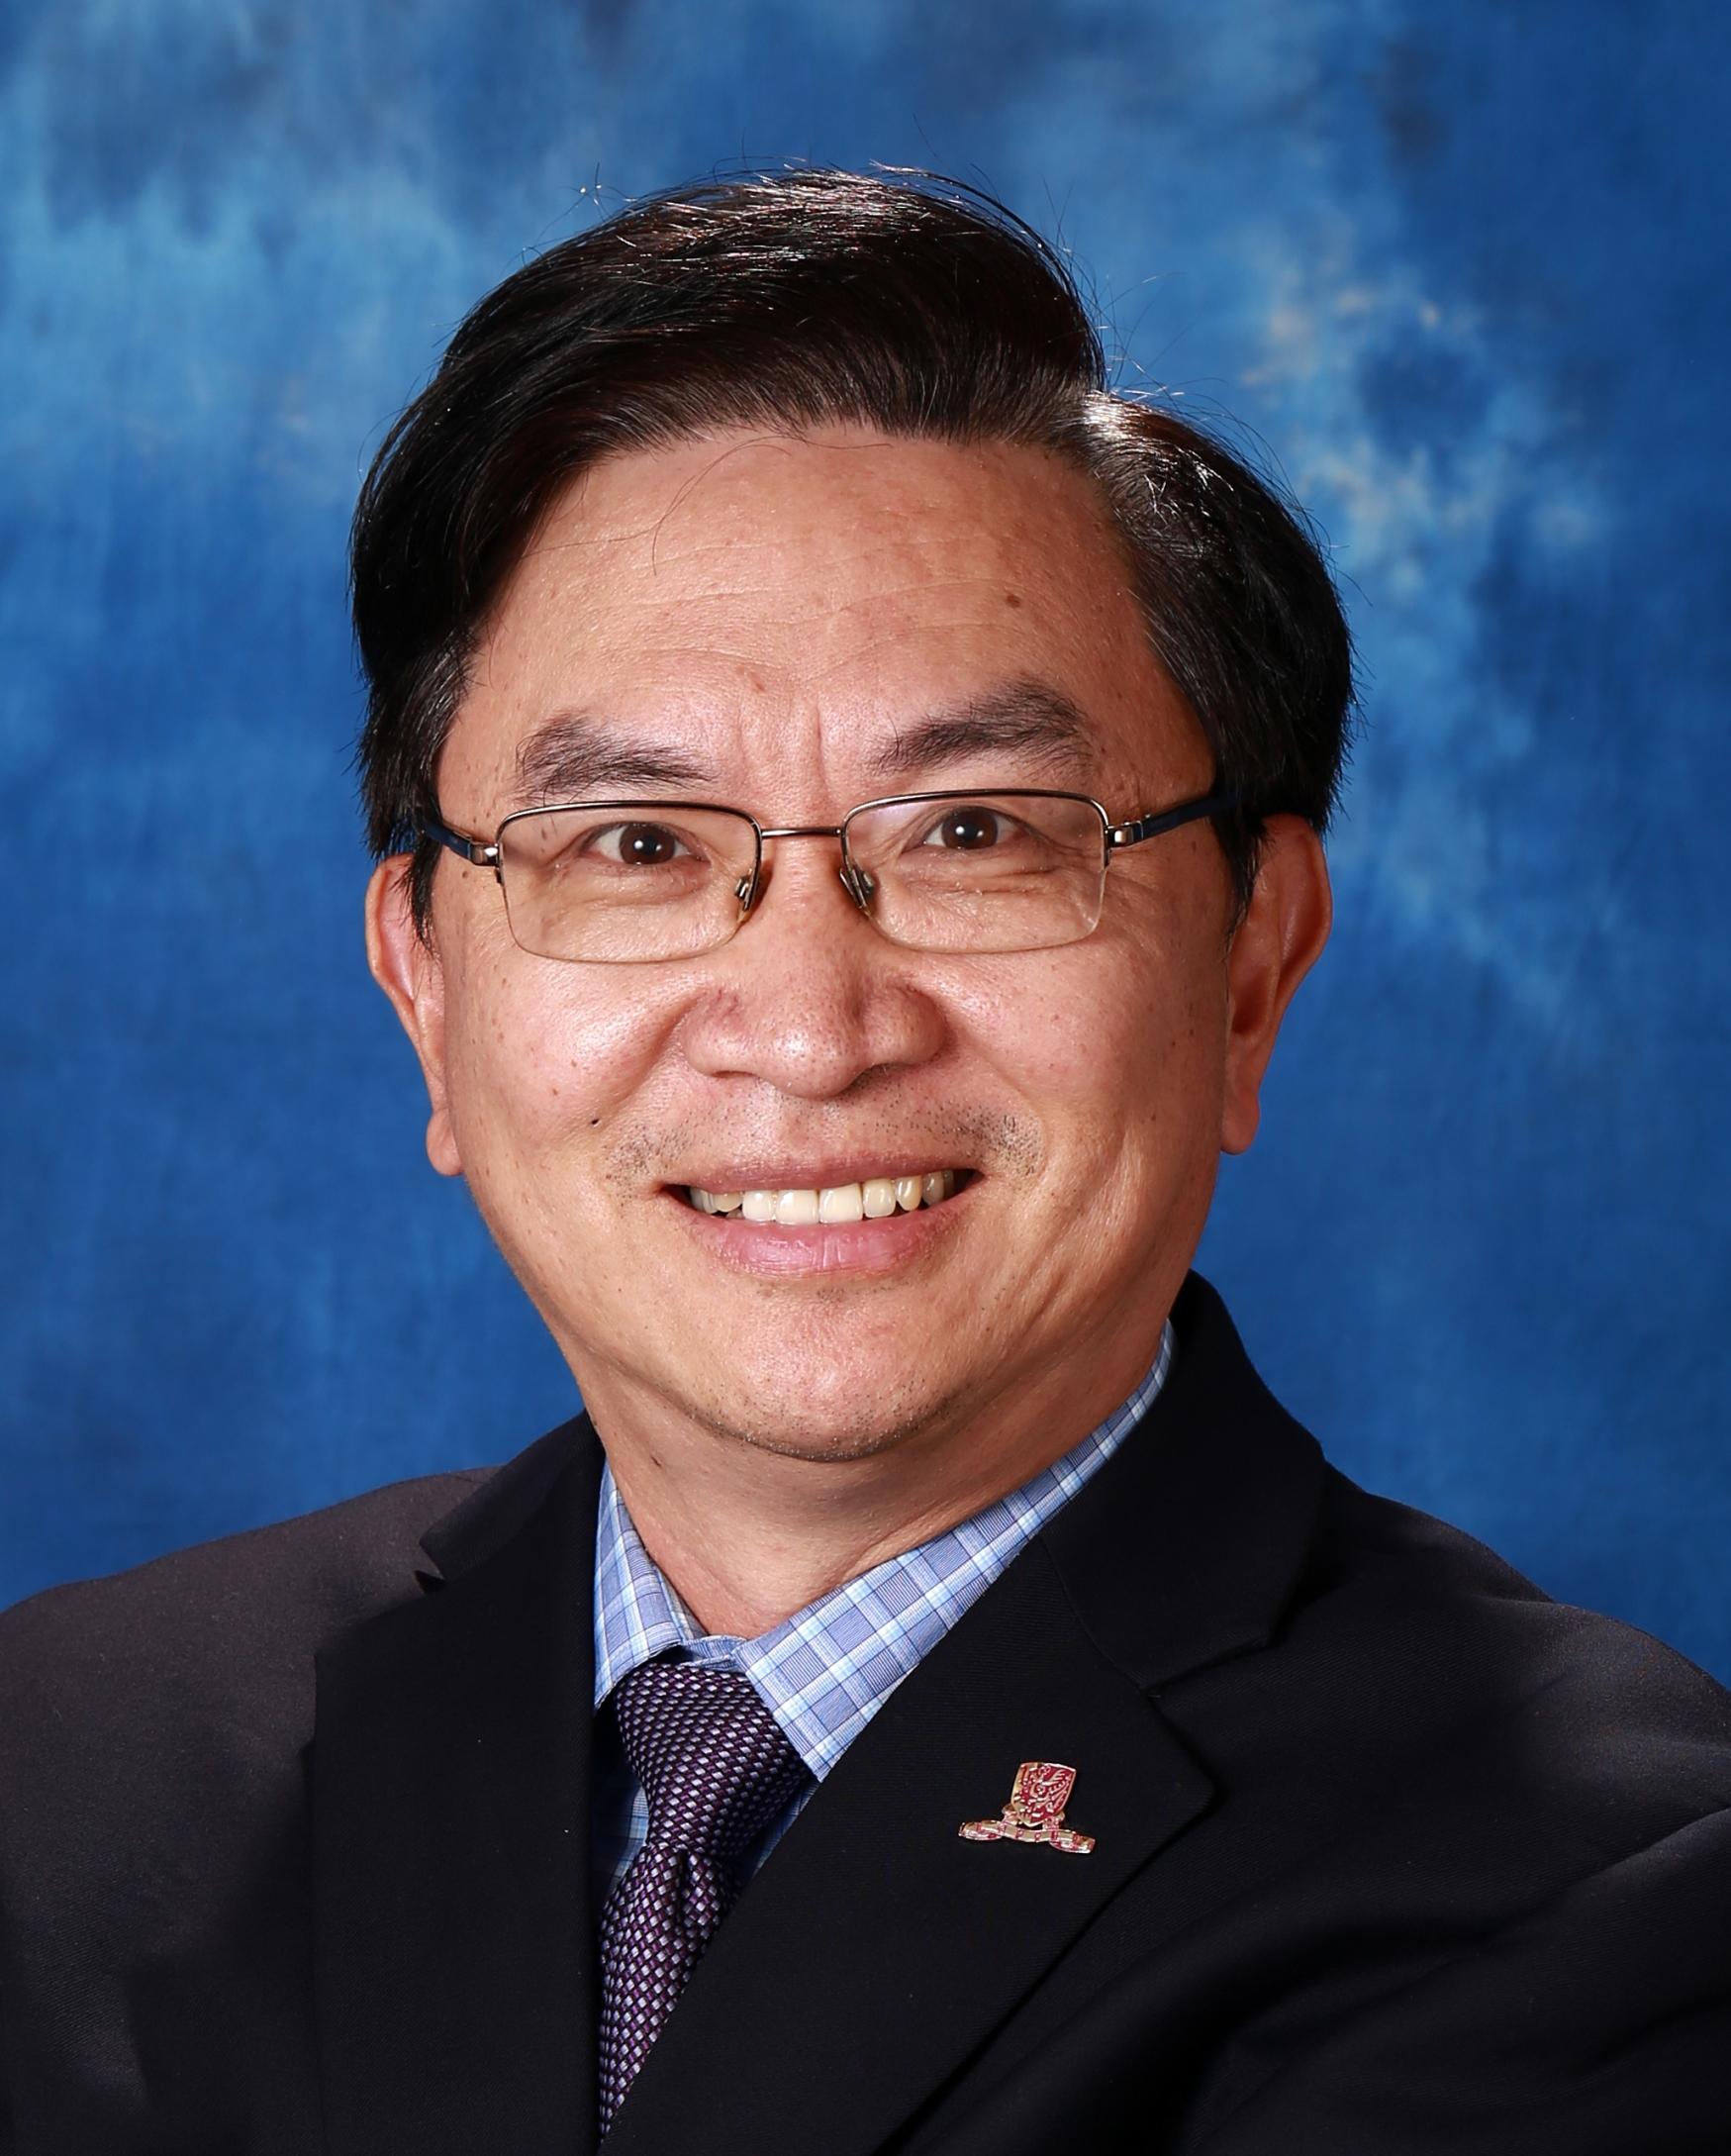 Dr. Michael Rung-Tsong Lyu